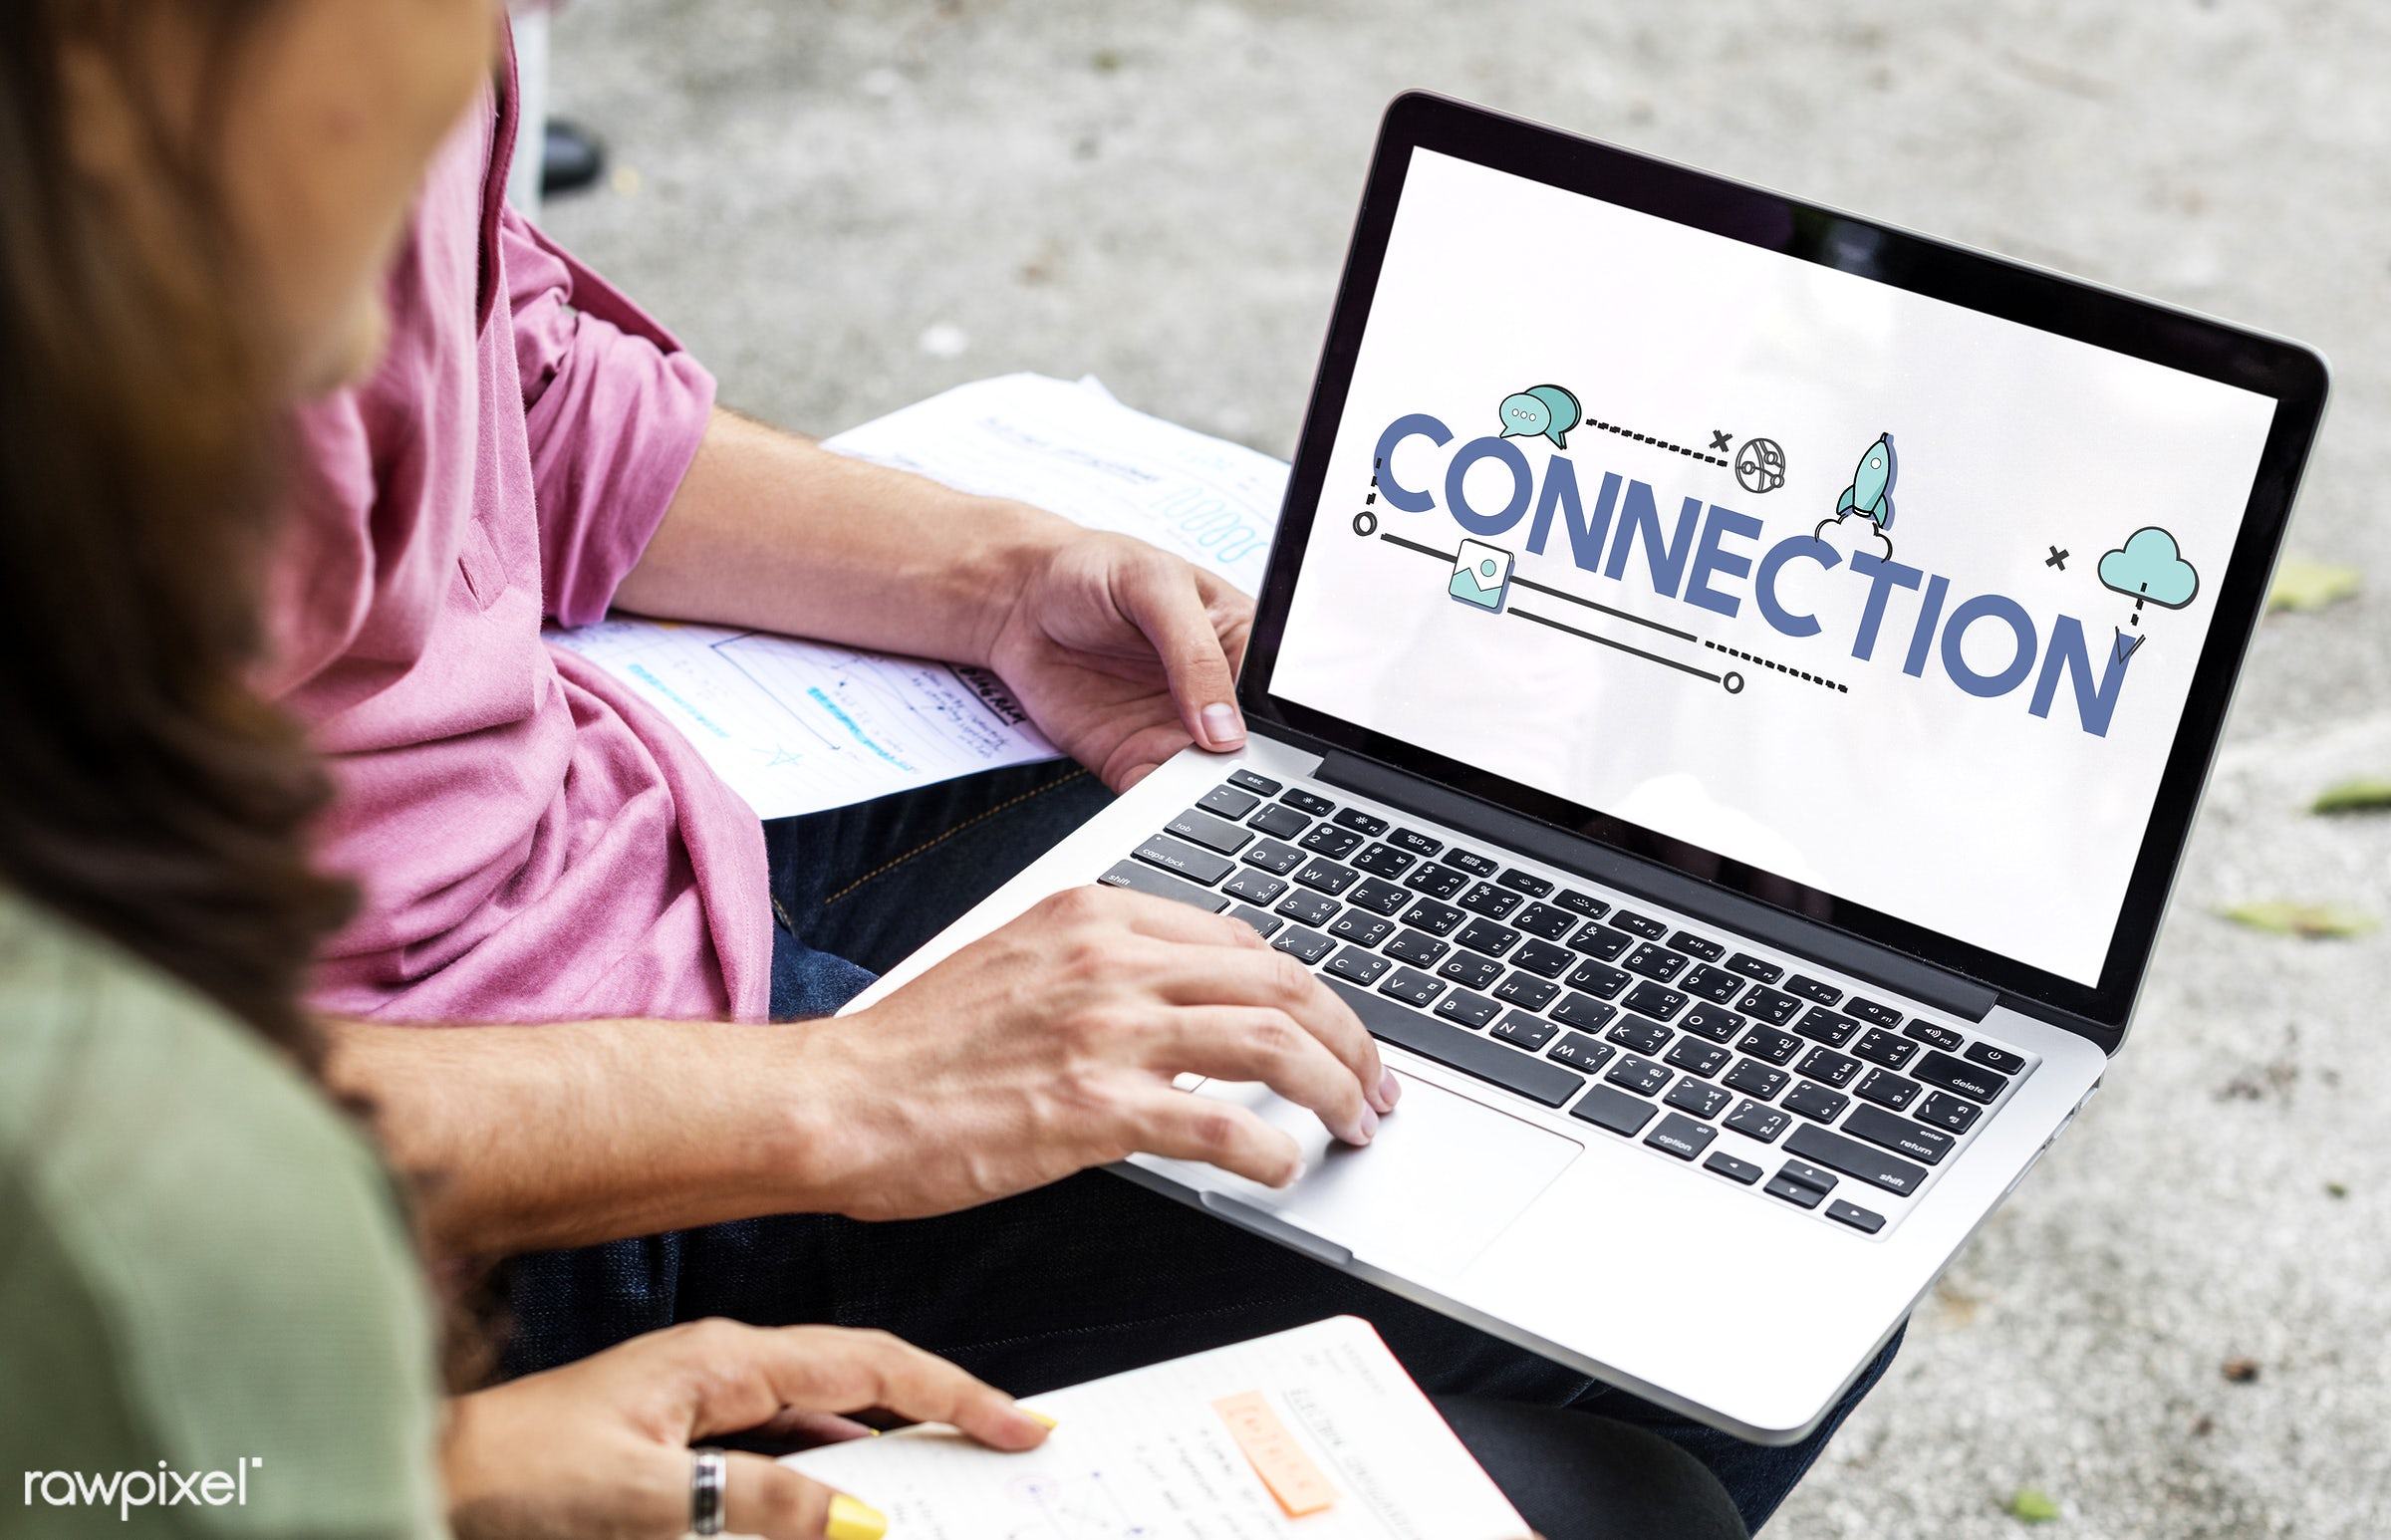 asian, browsing, caucasian, chat, communication, connect, connection, data, devices, digital, diversity, enjoyment, friends...